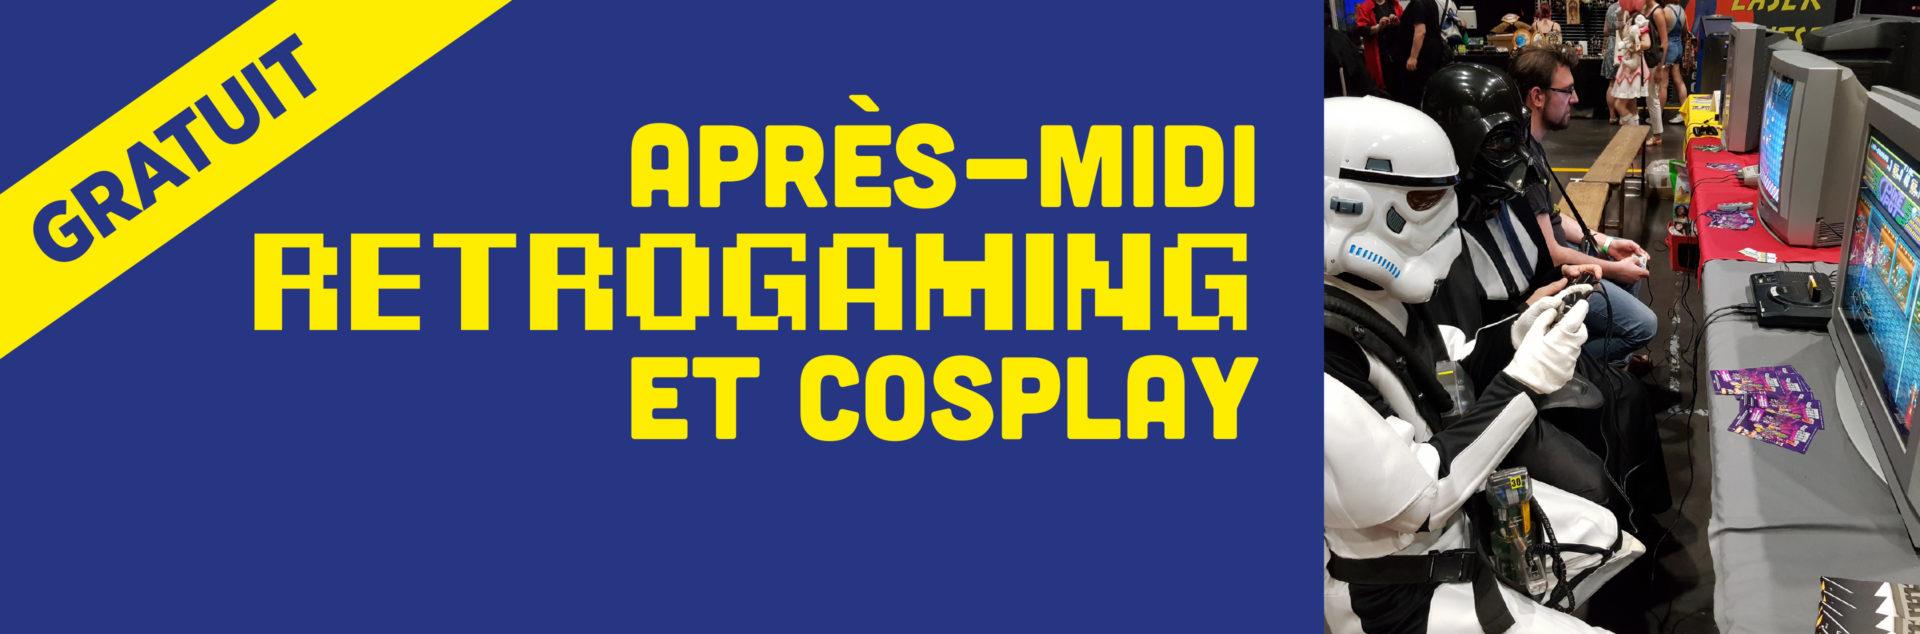 Après-midi retrogaming et cosplay